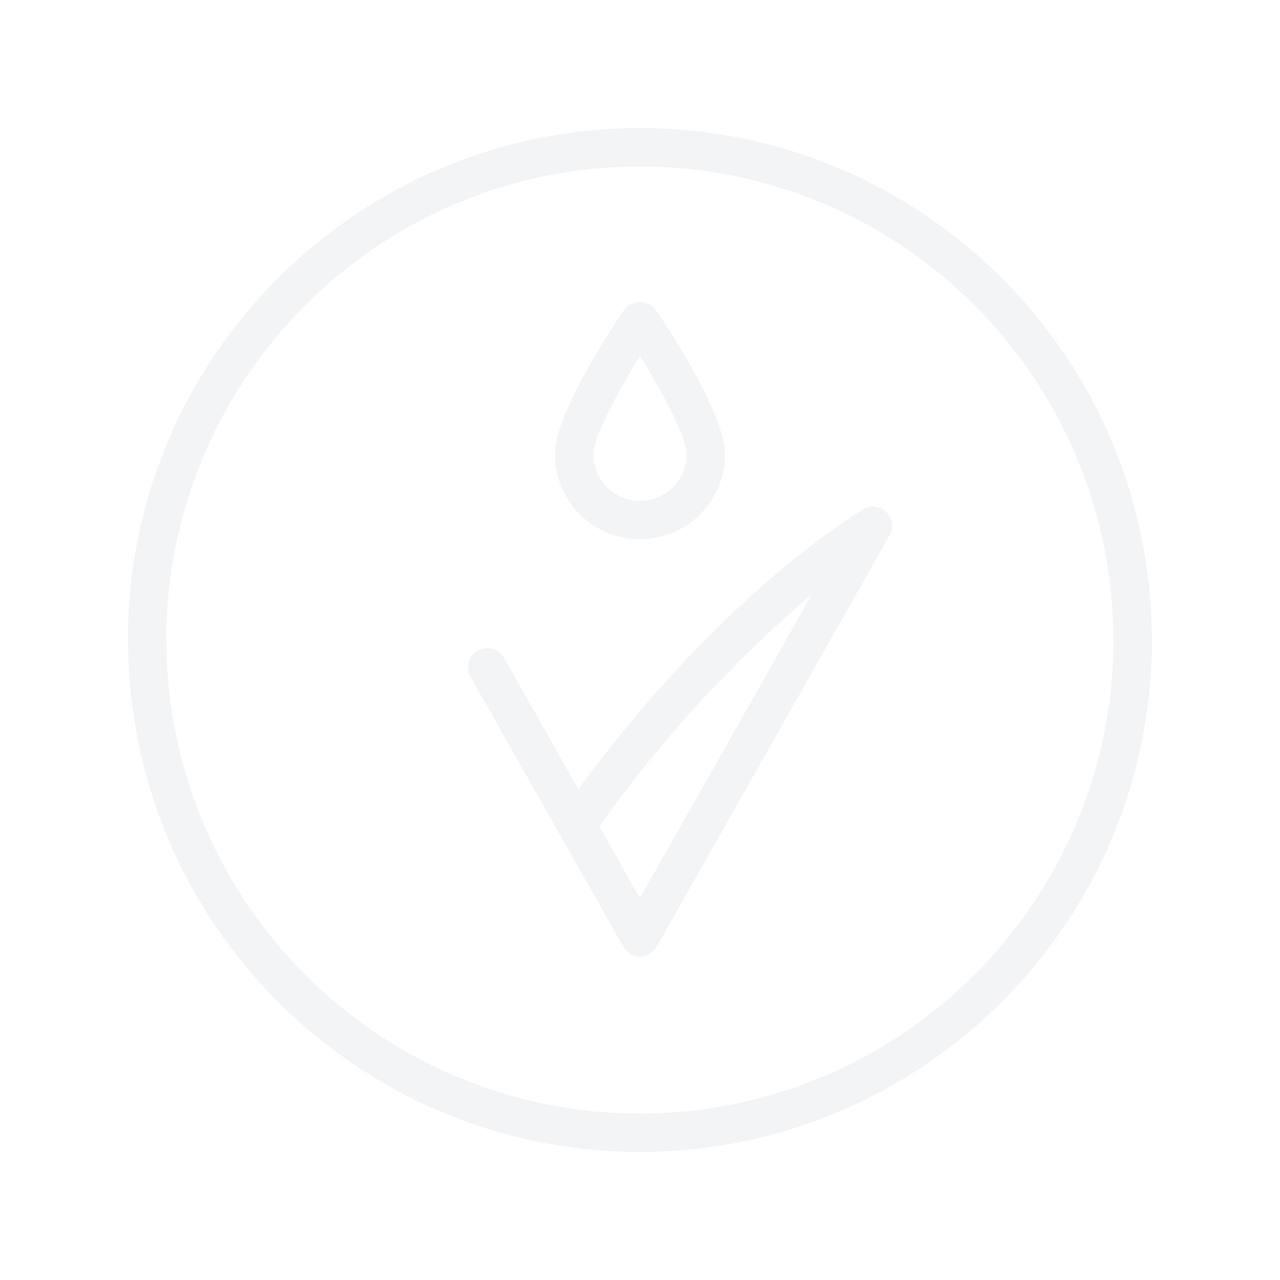 NATURA SIBERICA Saaremaa Moisturizing Shampoo 400ml